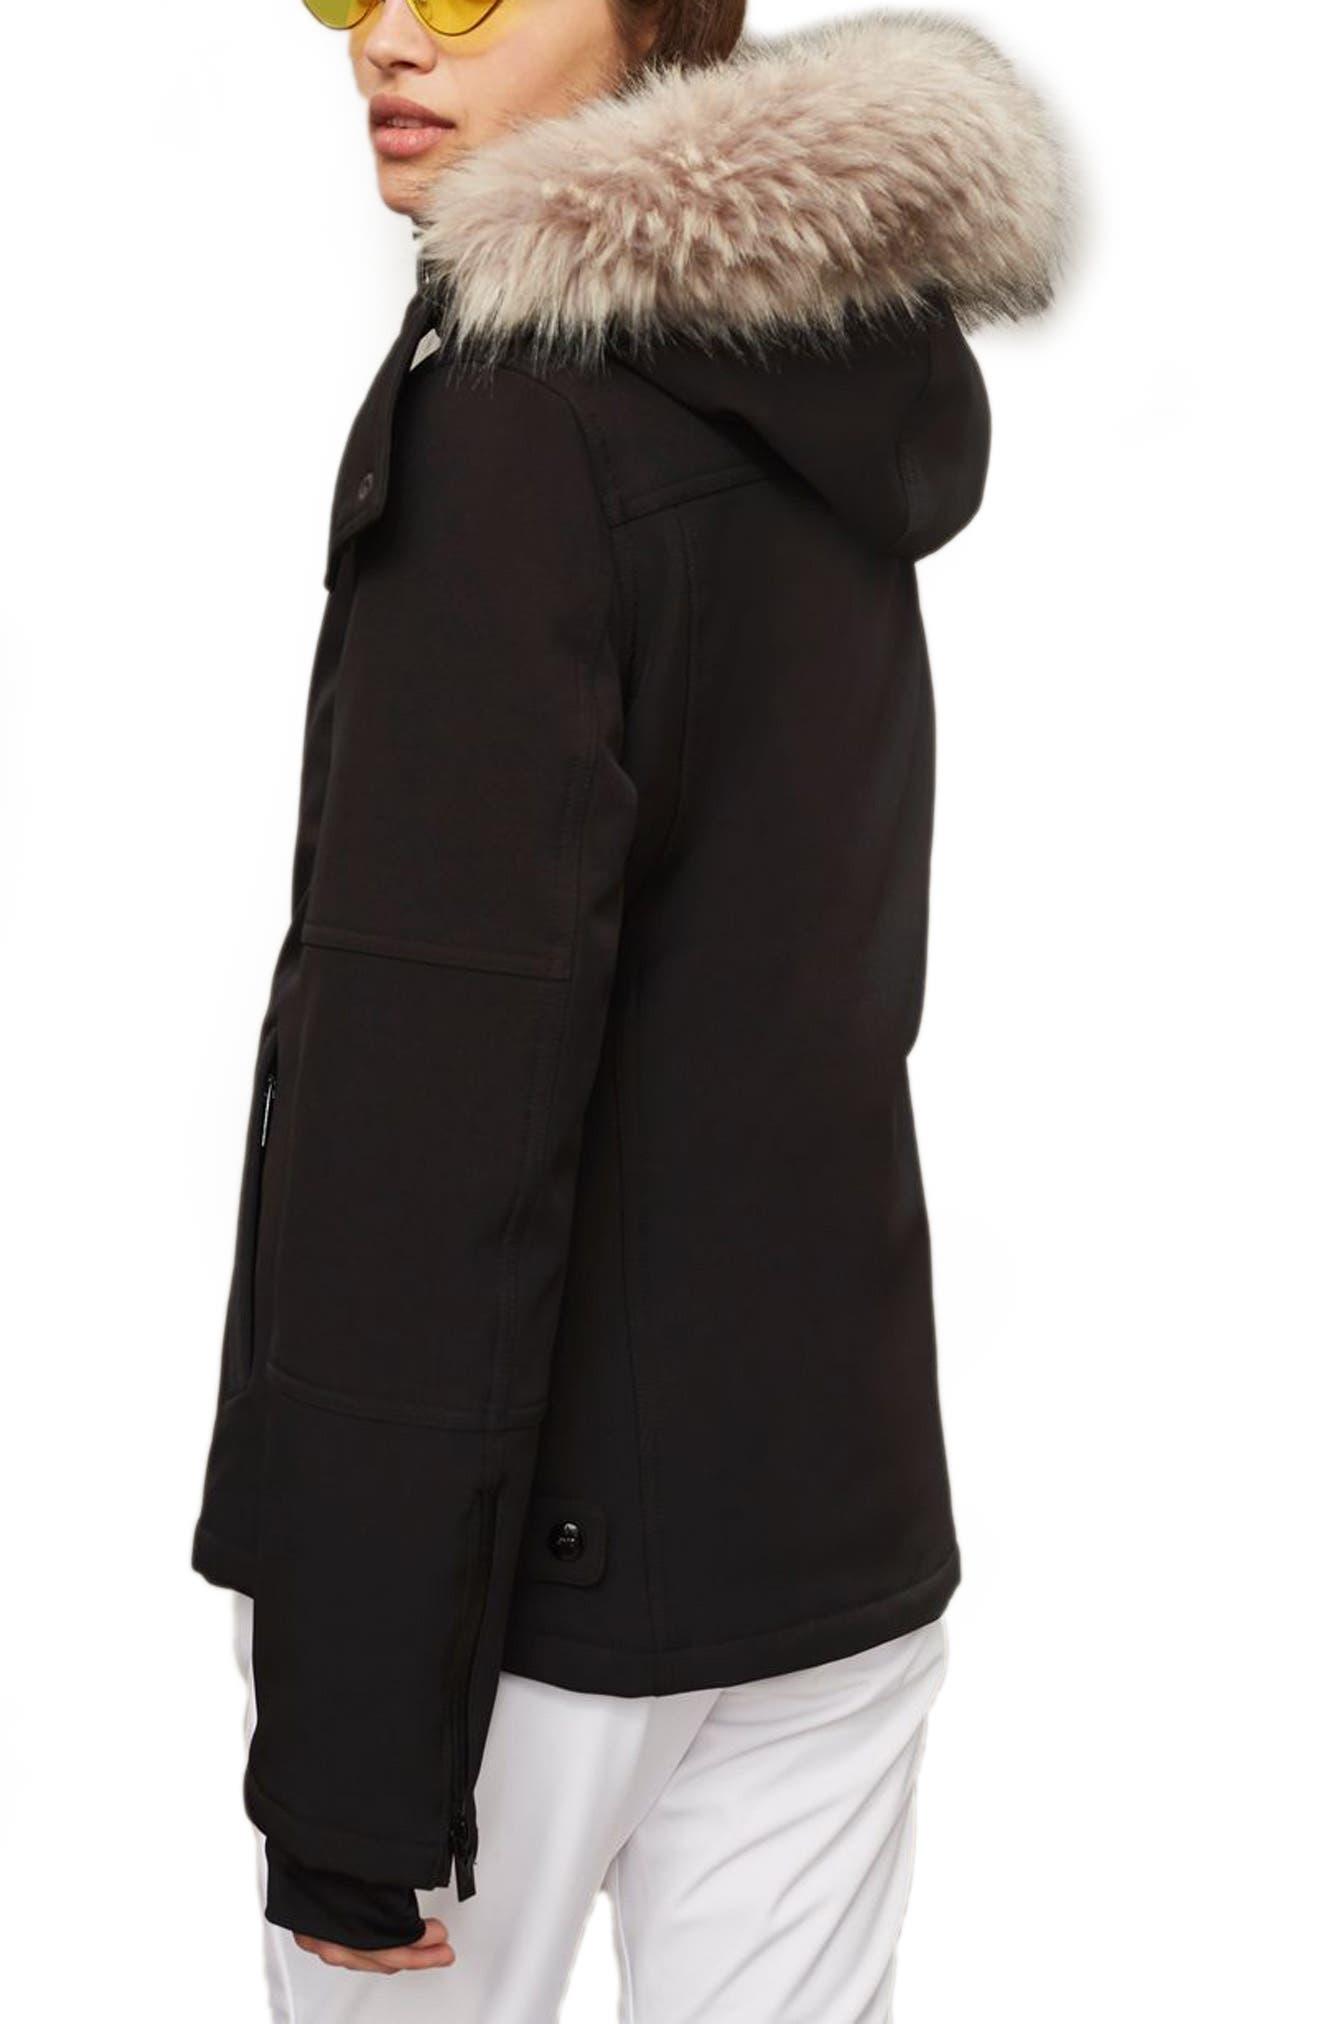 SNO Gladiator Faux Fur Hood Puffer Jacket,                             Alternate thumbnail 4, color,                             Black